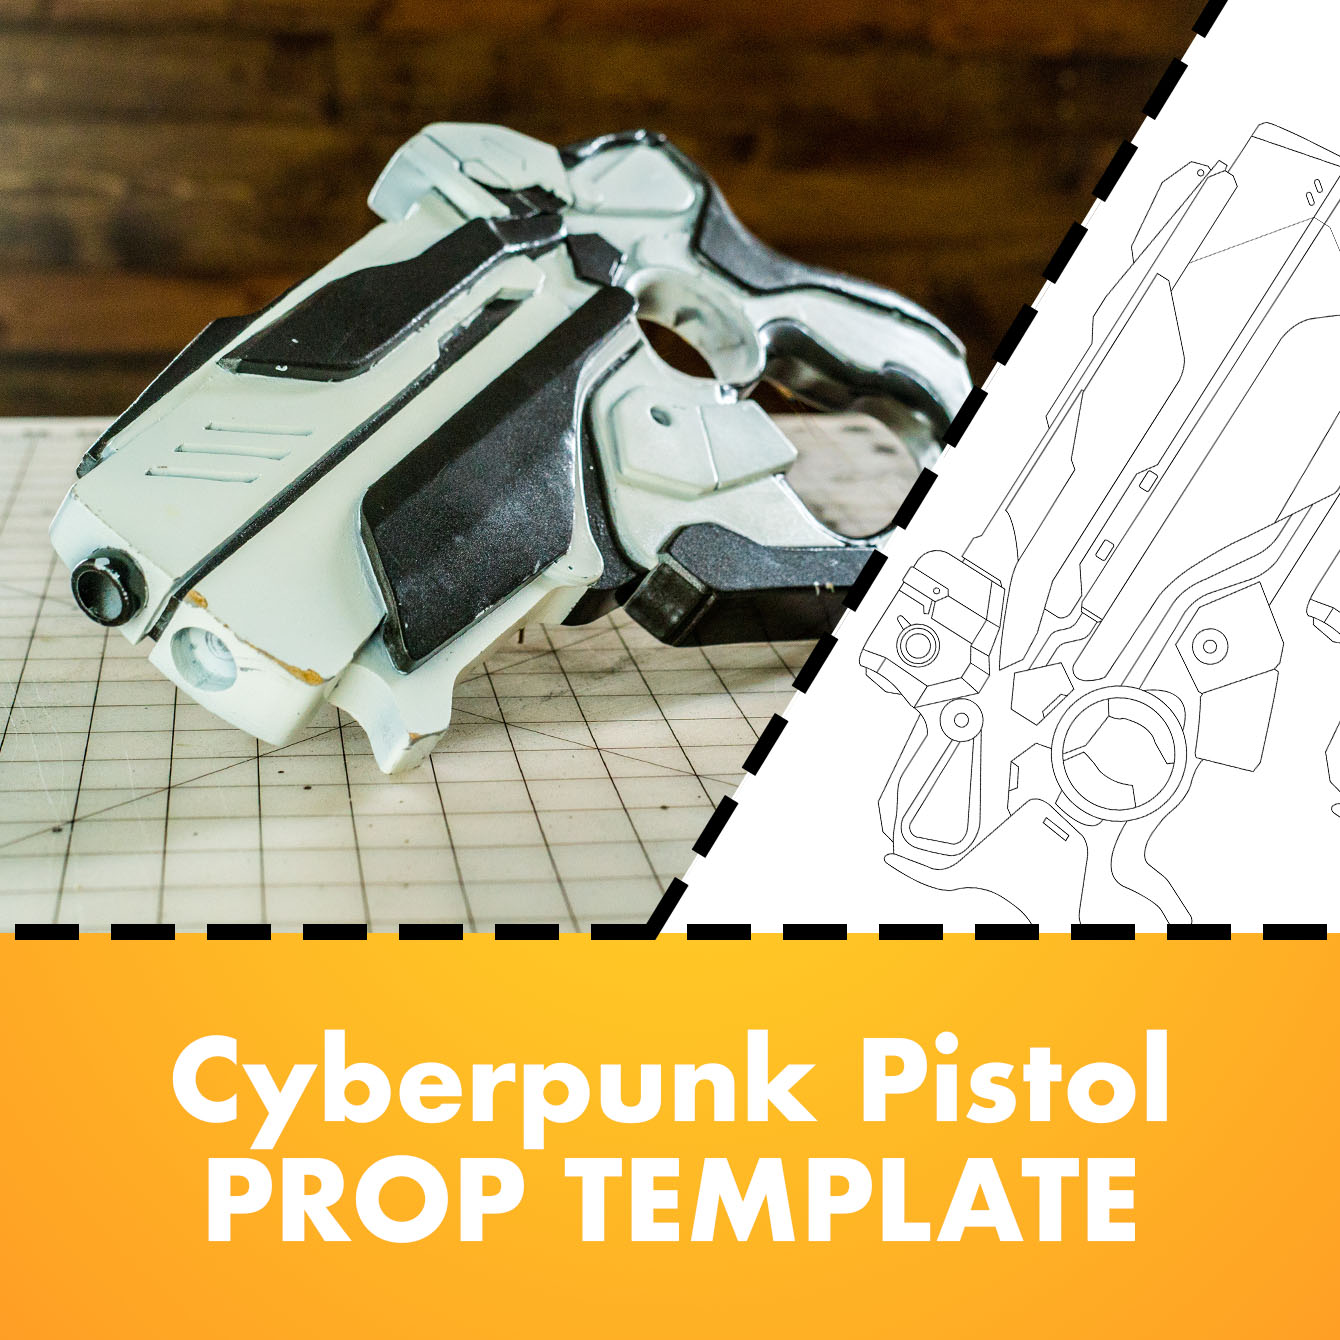 CyberpunkPistol_Cover.jpg